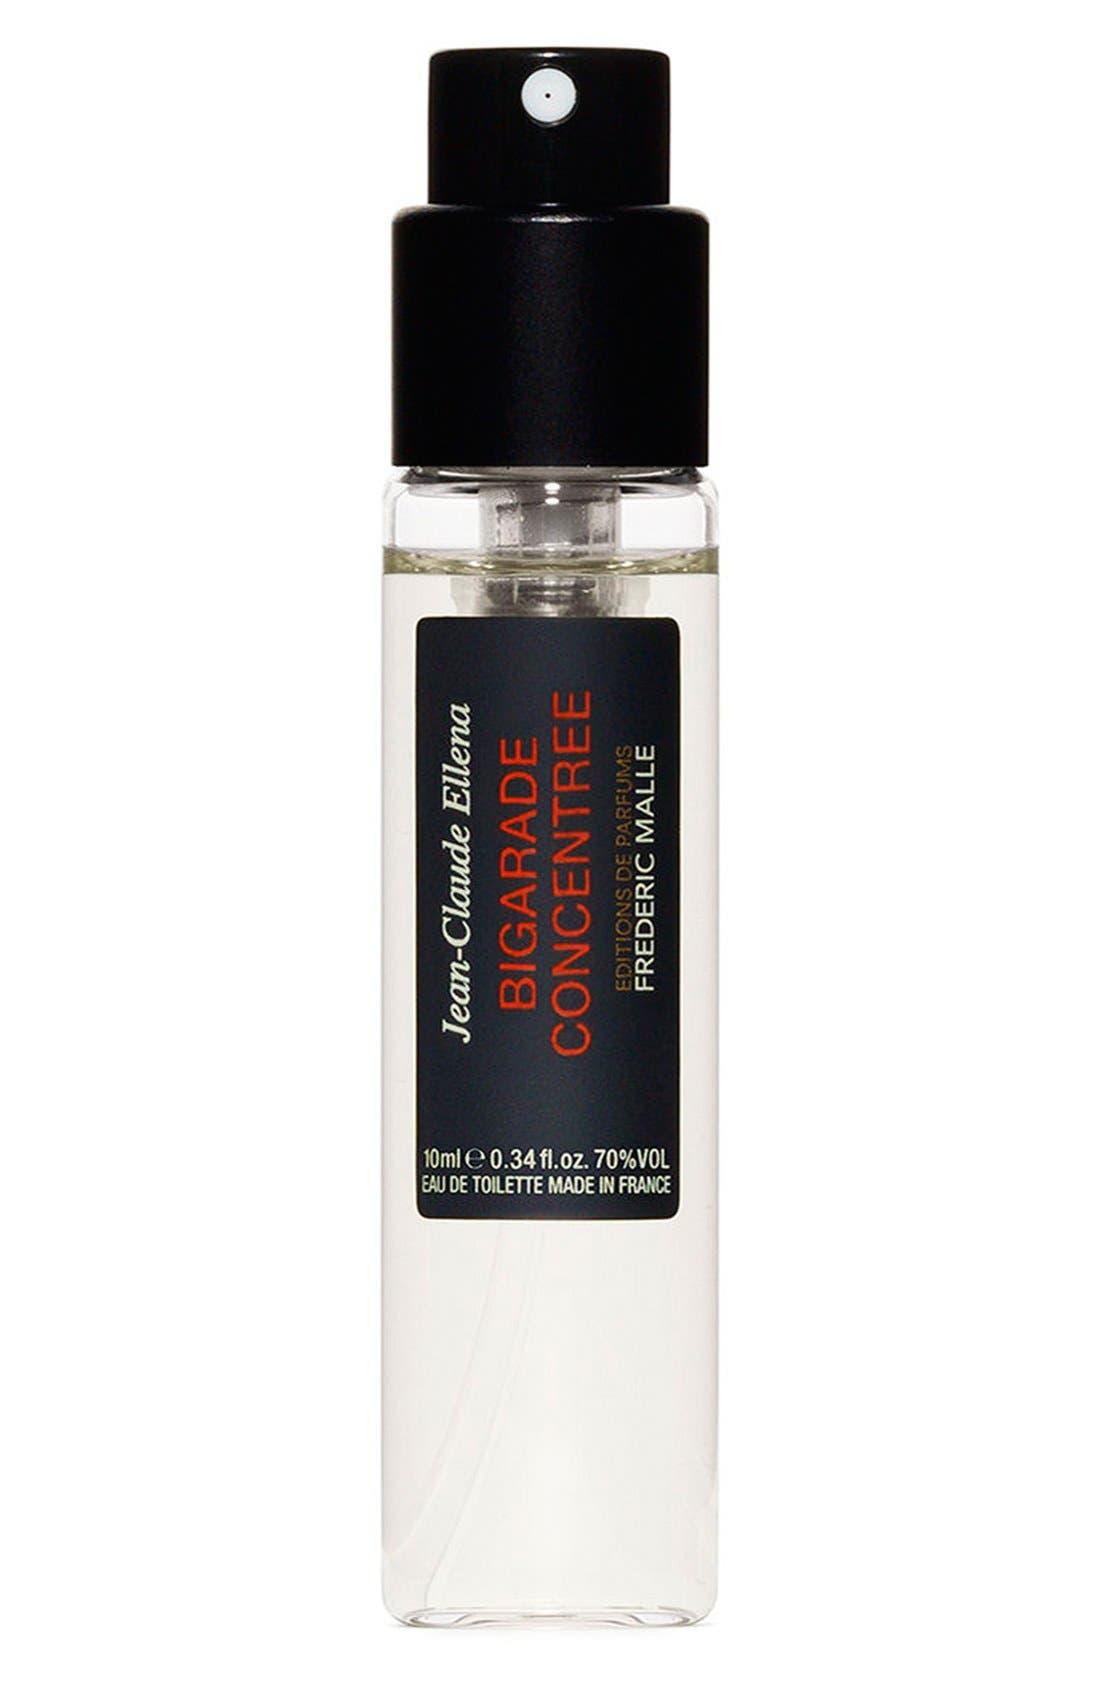 Editions de Parfums Frédéric Malle Bigarade Concentrée Parfum Travel Spray